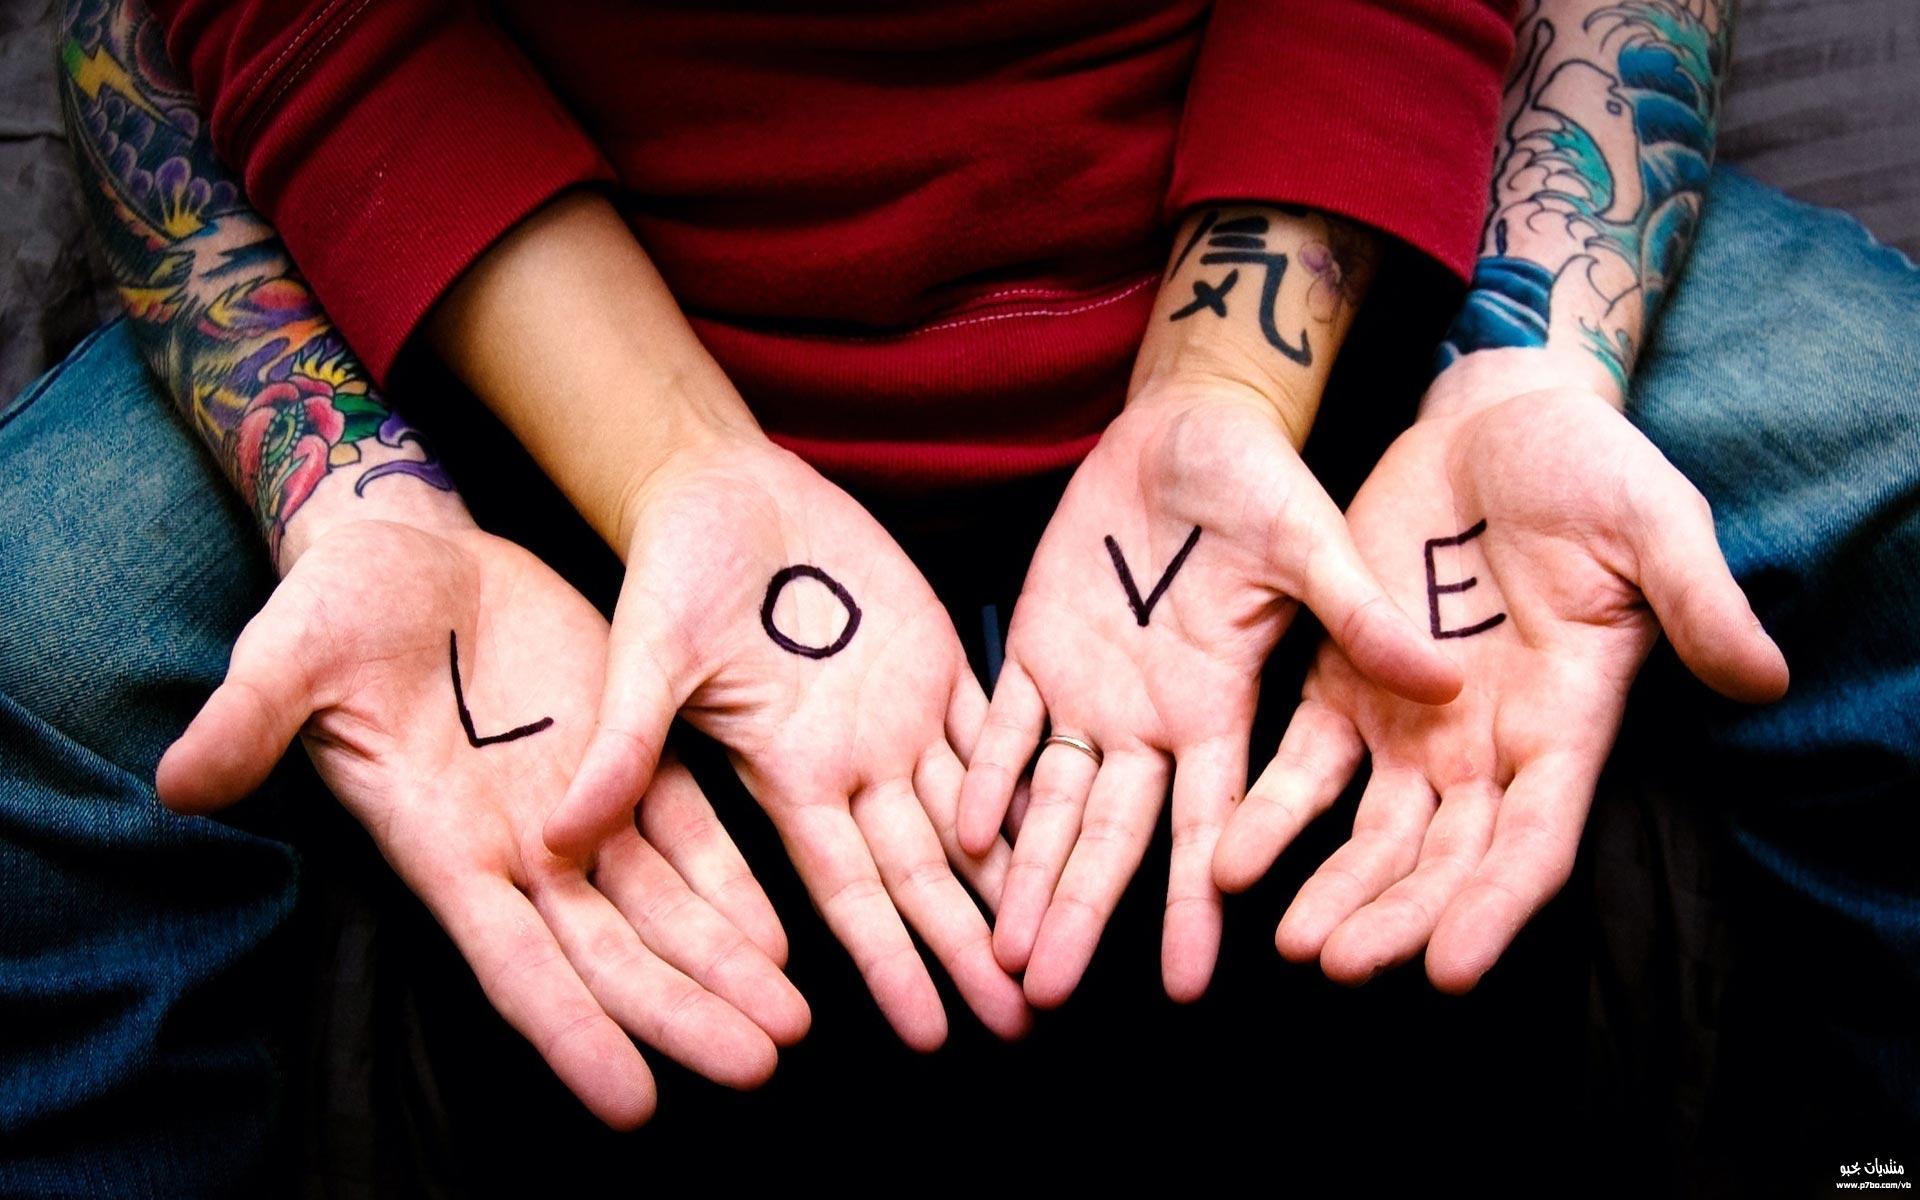 ��� ��, ���� ��� ���� 2016 Love , ���� ��� ���� ������ ���������� ������� 2015_1391459077_336.